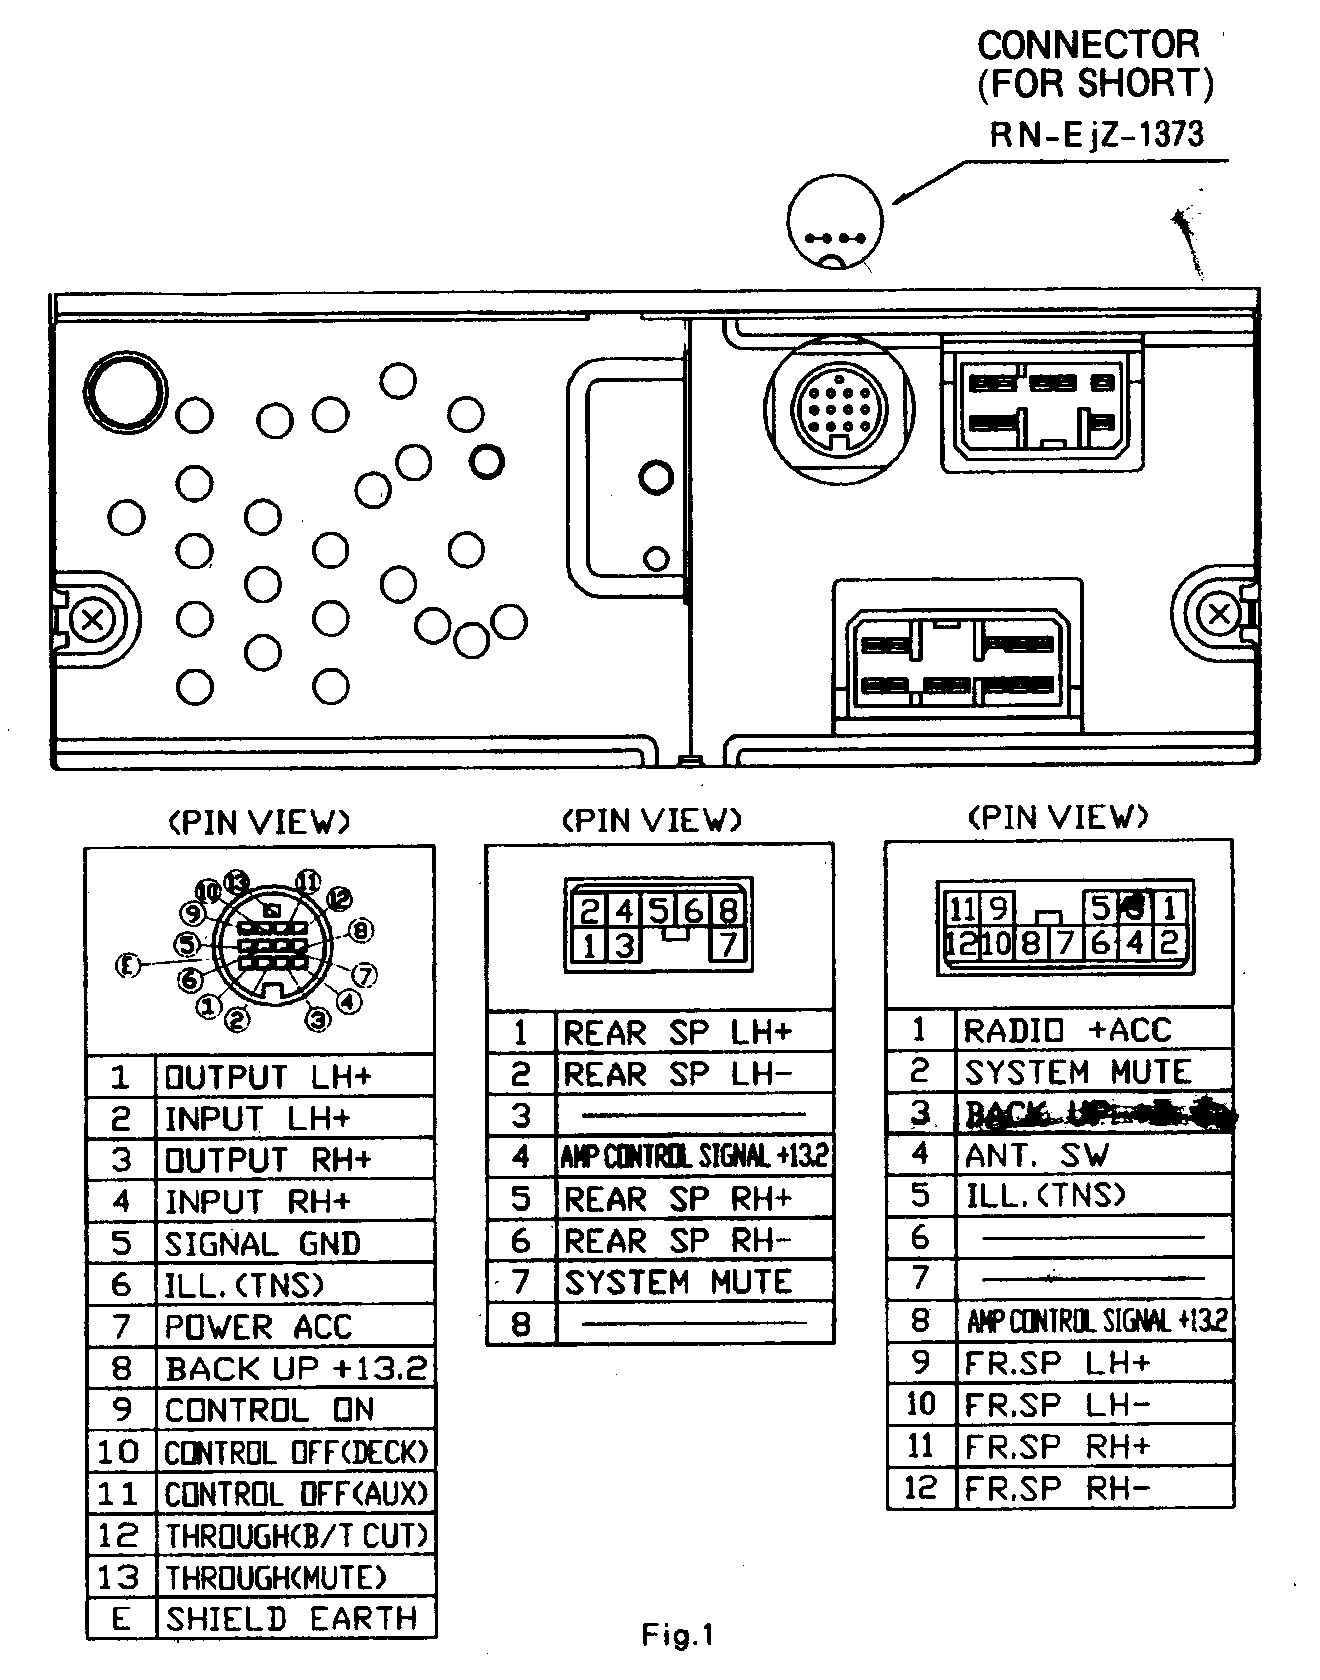 nissan micra k11 stereo wiring diagram nemetas aufgegabelt info 2006 nissan murano wiring diagram wireharnessmazda121001?resize=665%2c846 nissan micra k11 stereo wiring diagram